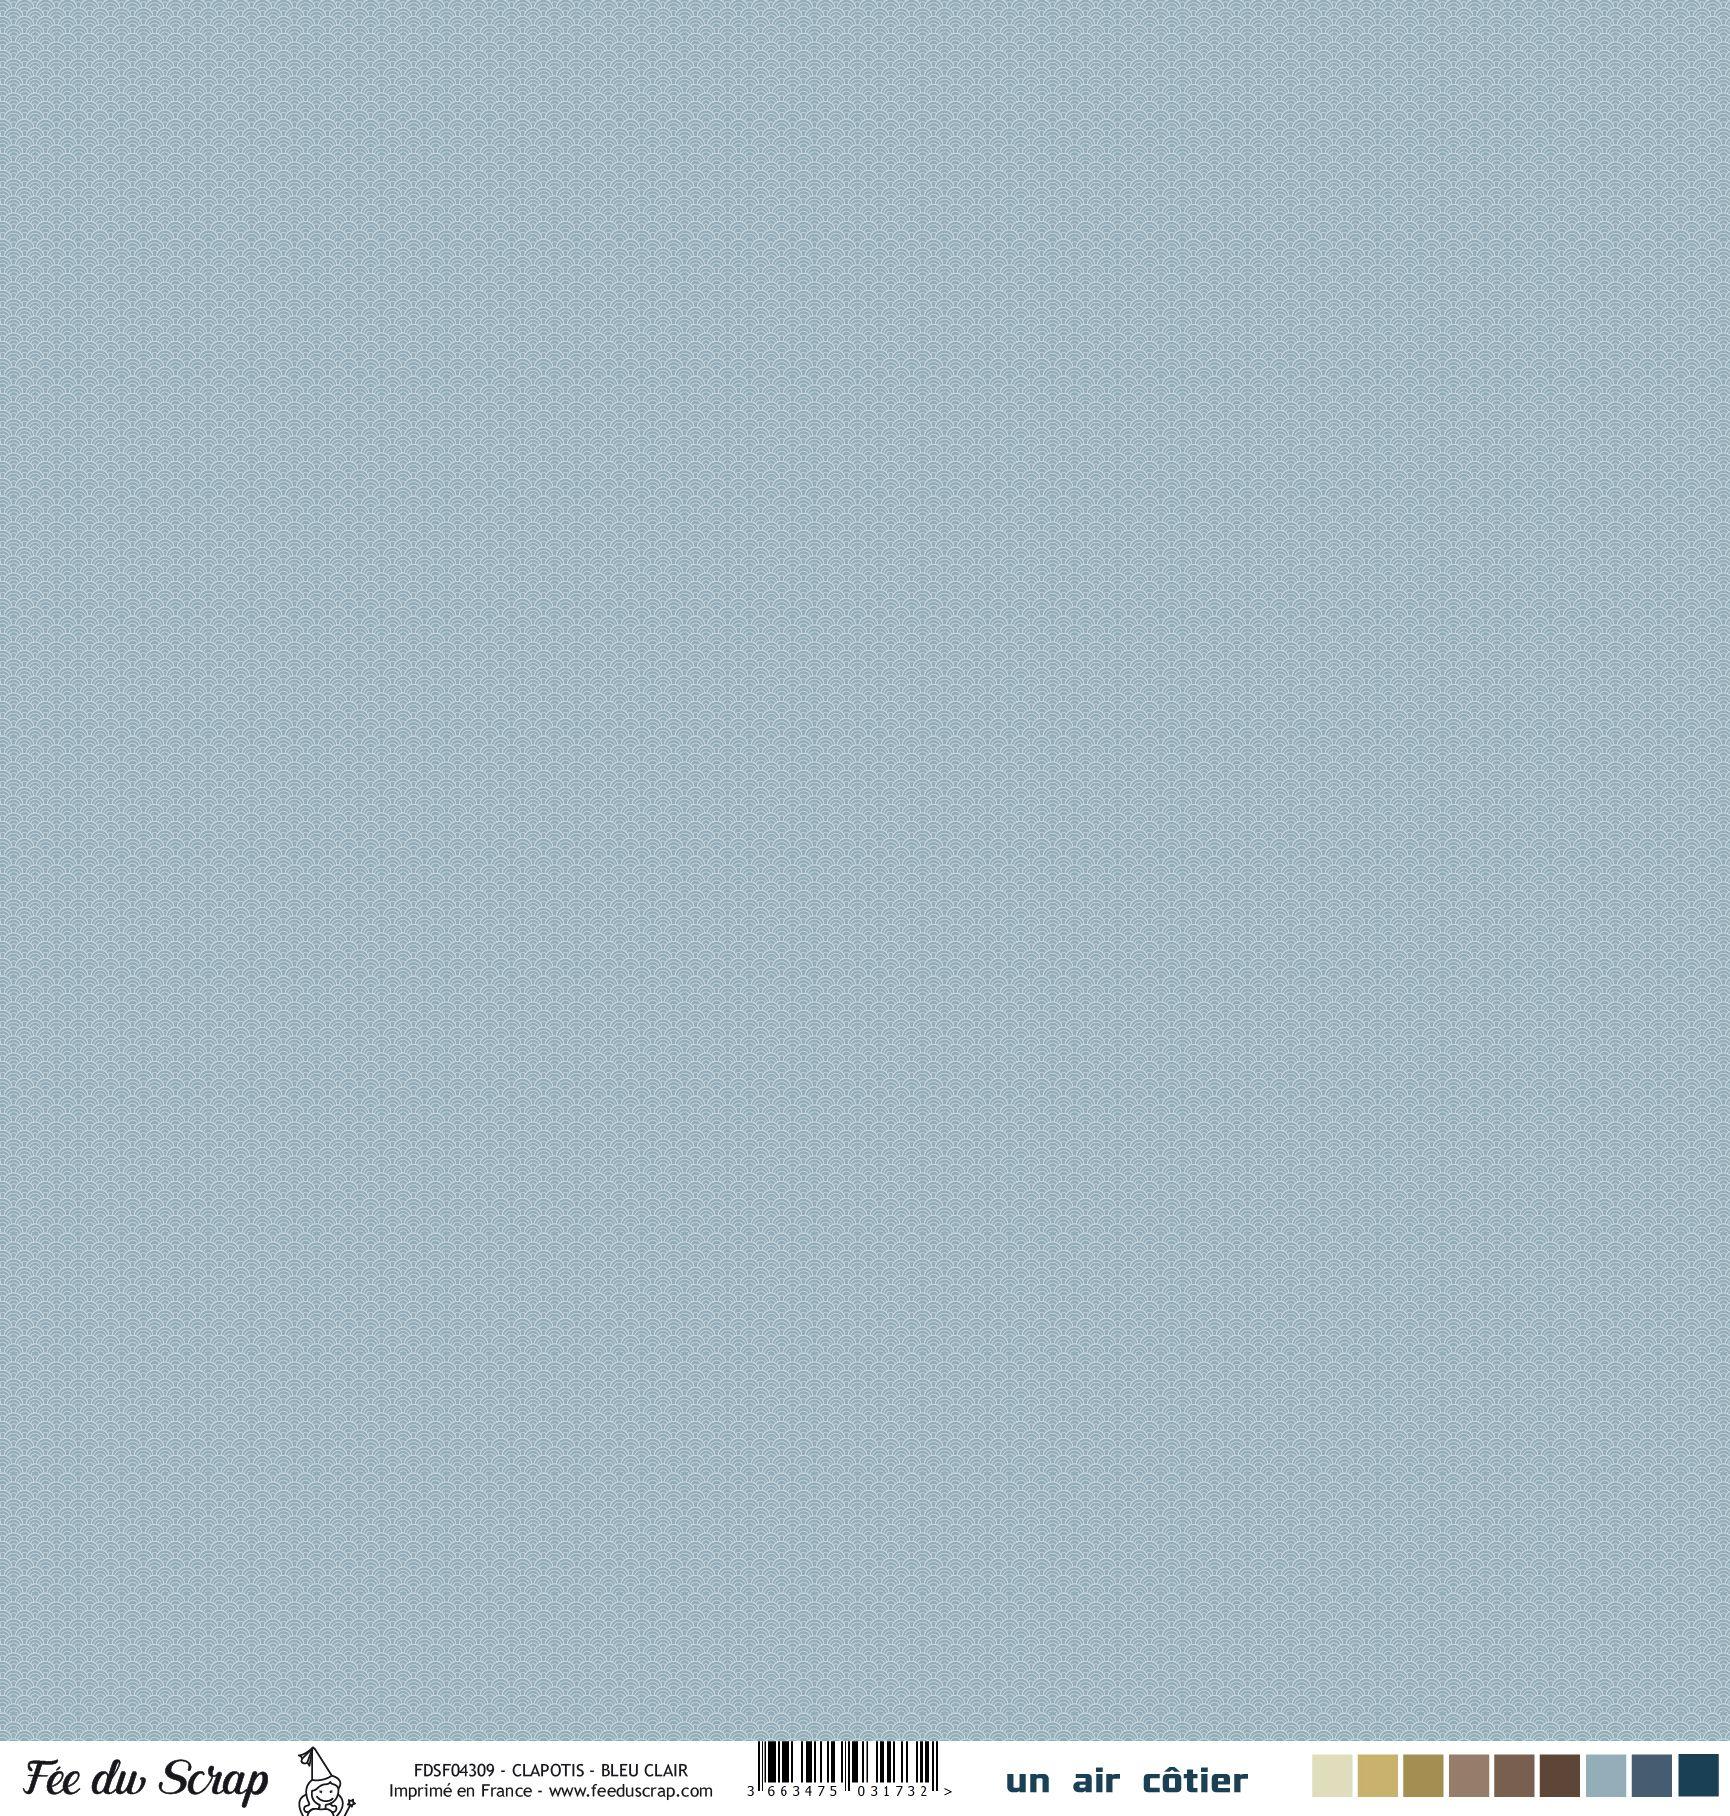 Feuille un air côtier - Clapotis bleu clair